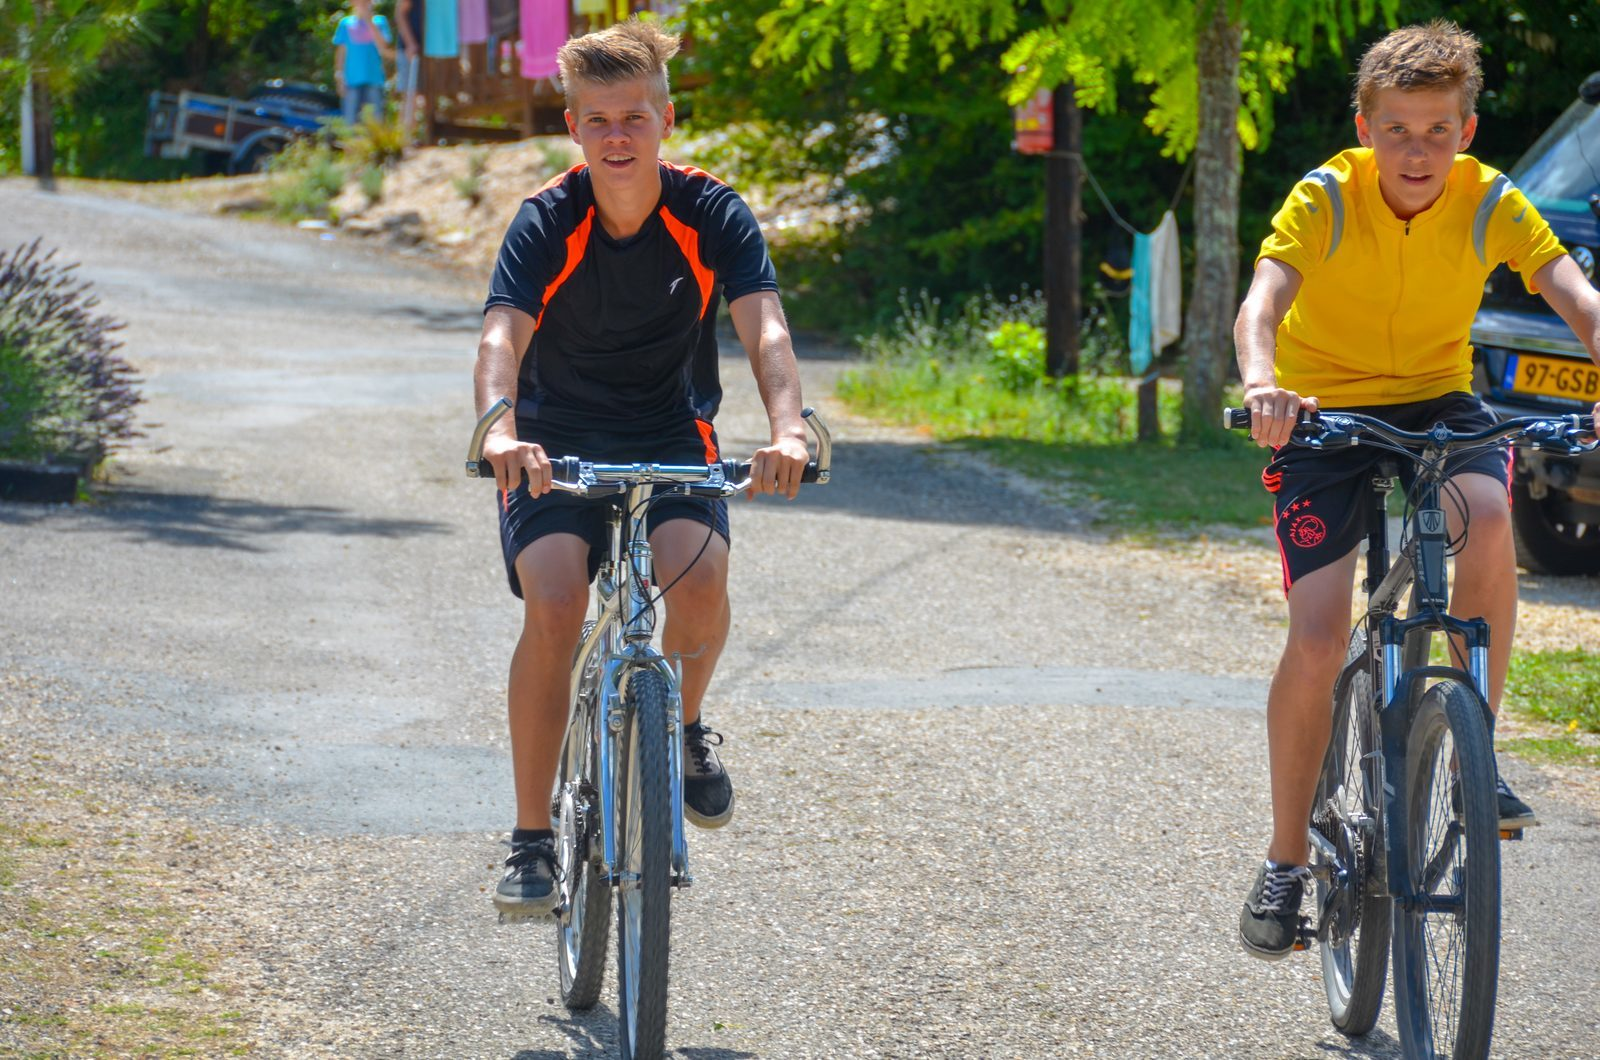 Mountain biking at La Draille